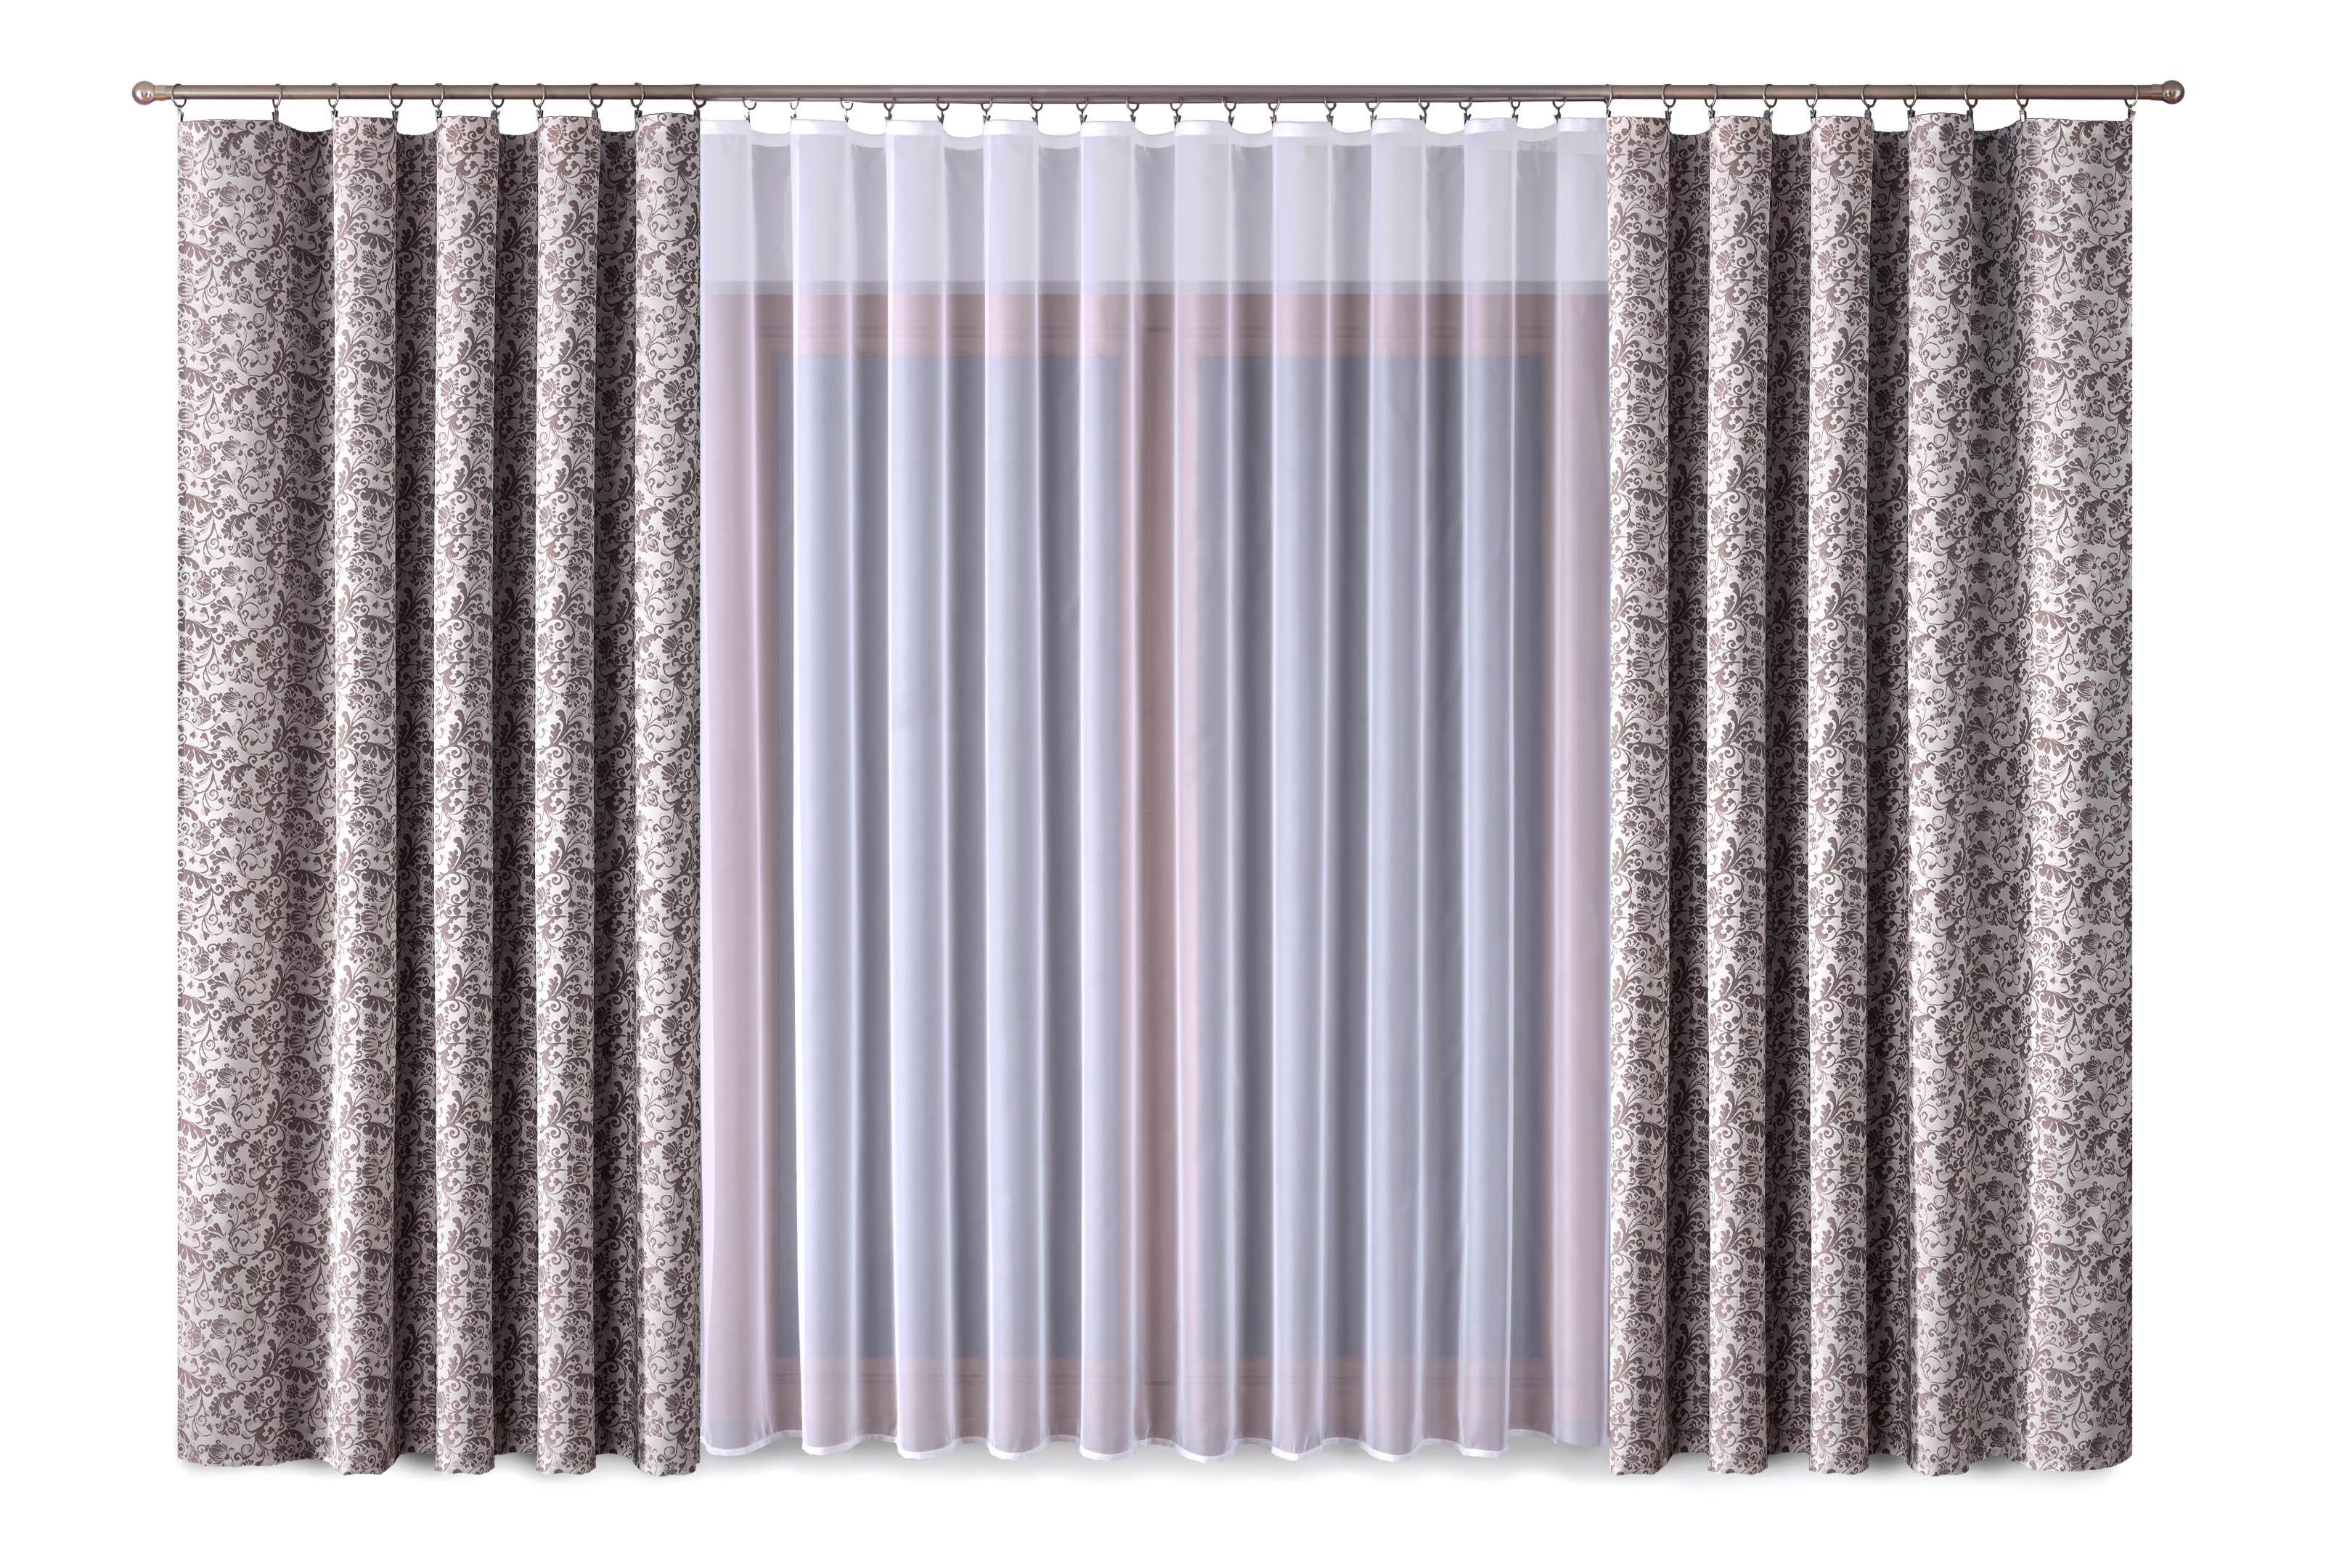 Шторы Primavera Классические шторы Posy Цвет: Коричневый-Белый шторы primavera классические шторы maev цвет салатовый